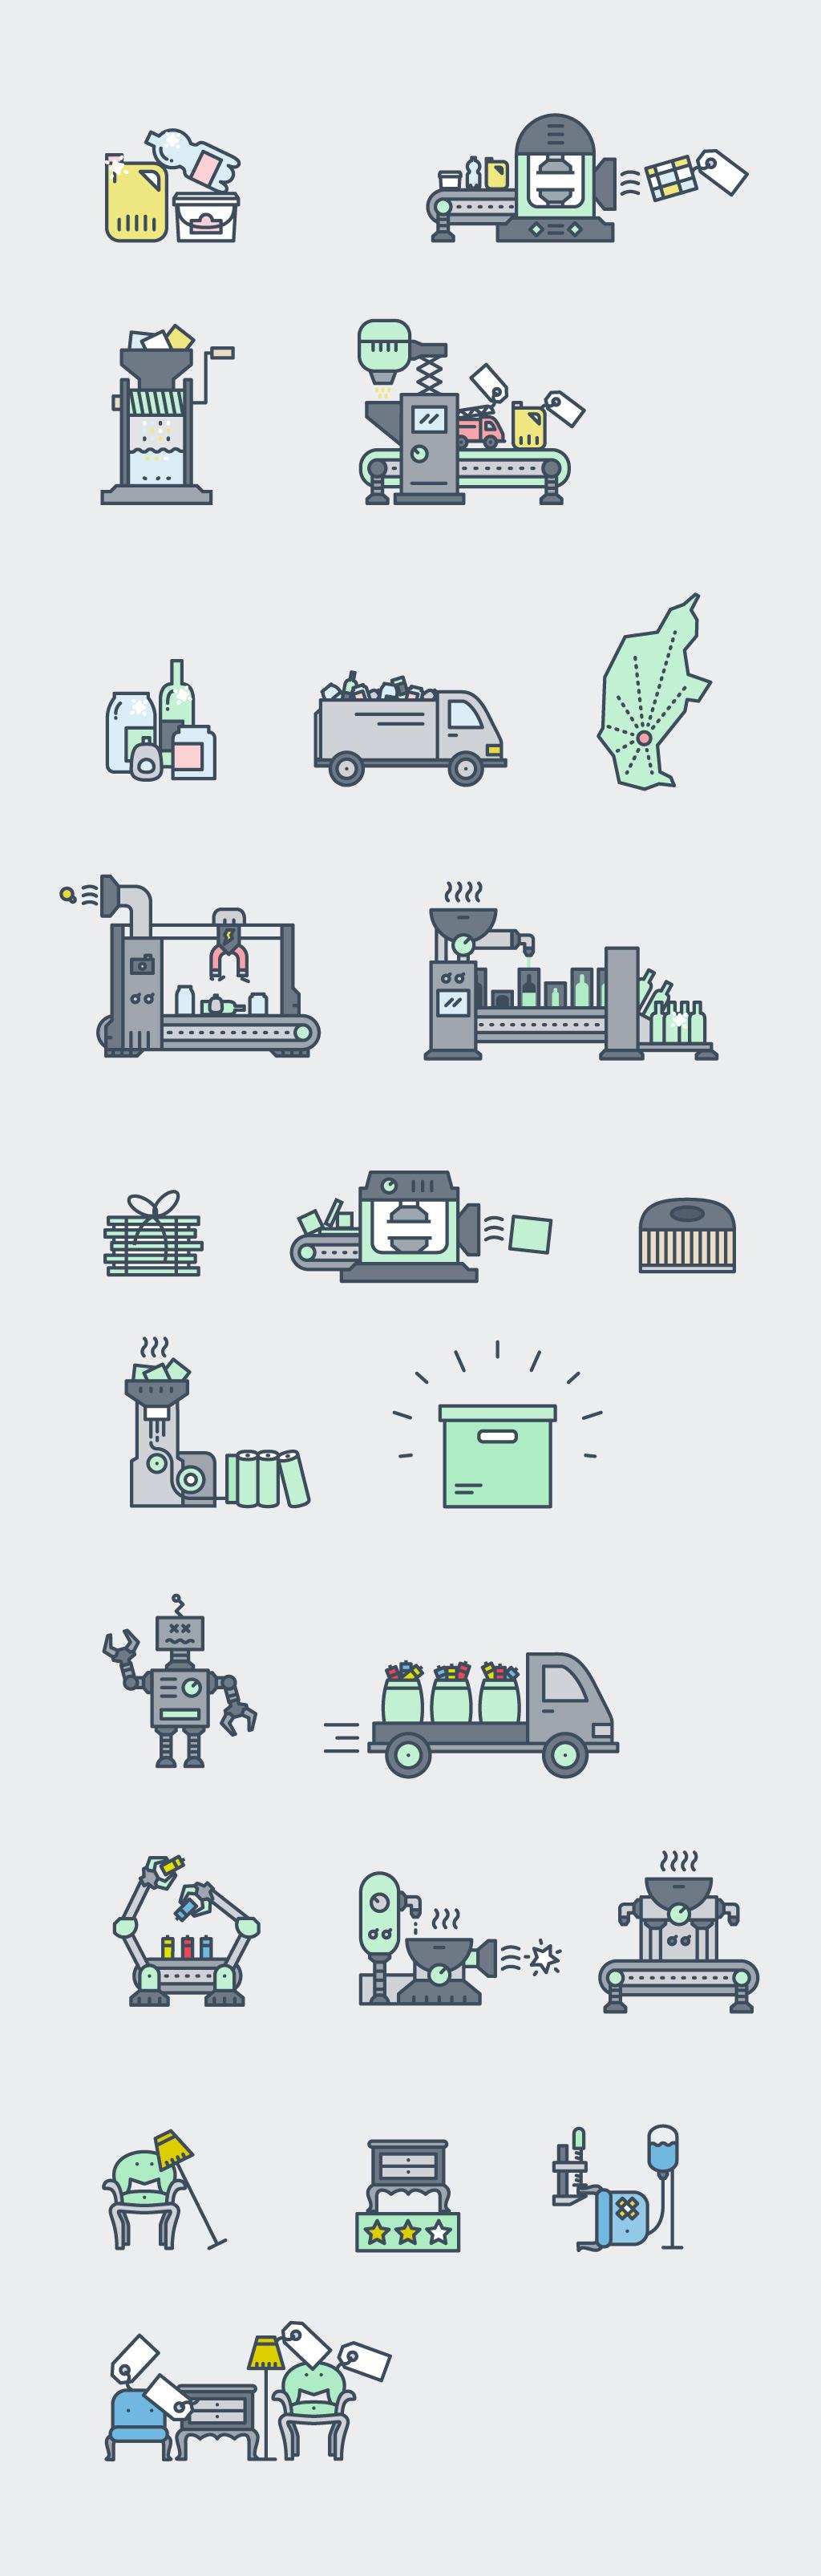 illustrationer til kolding kommune